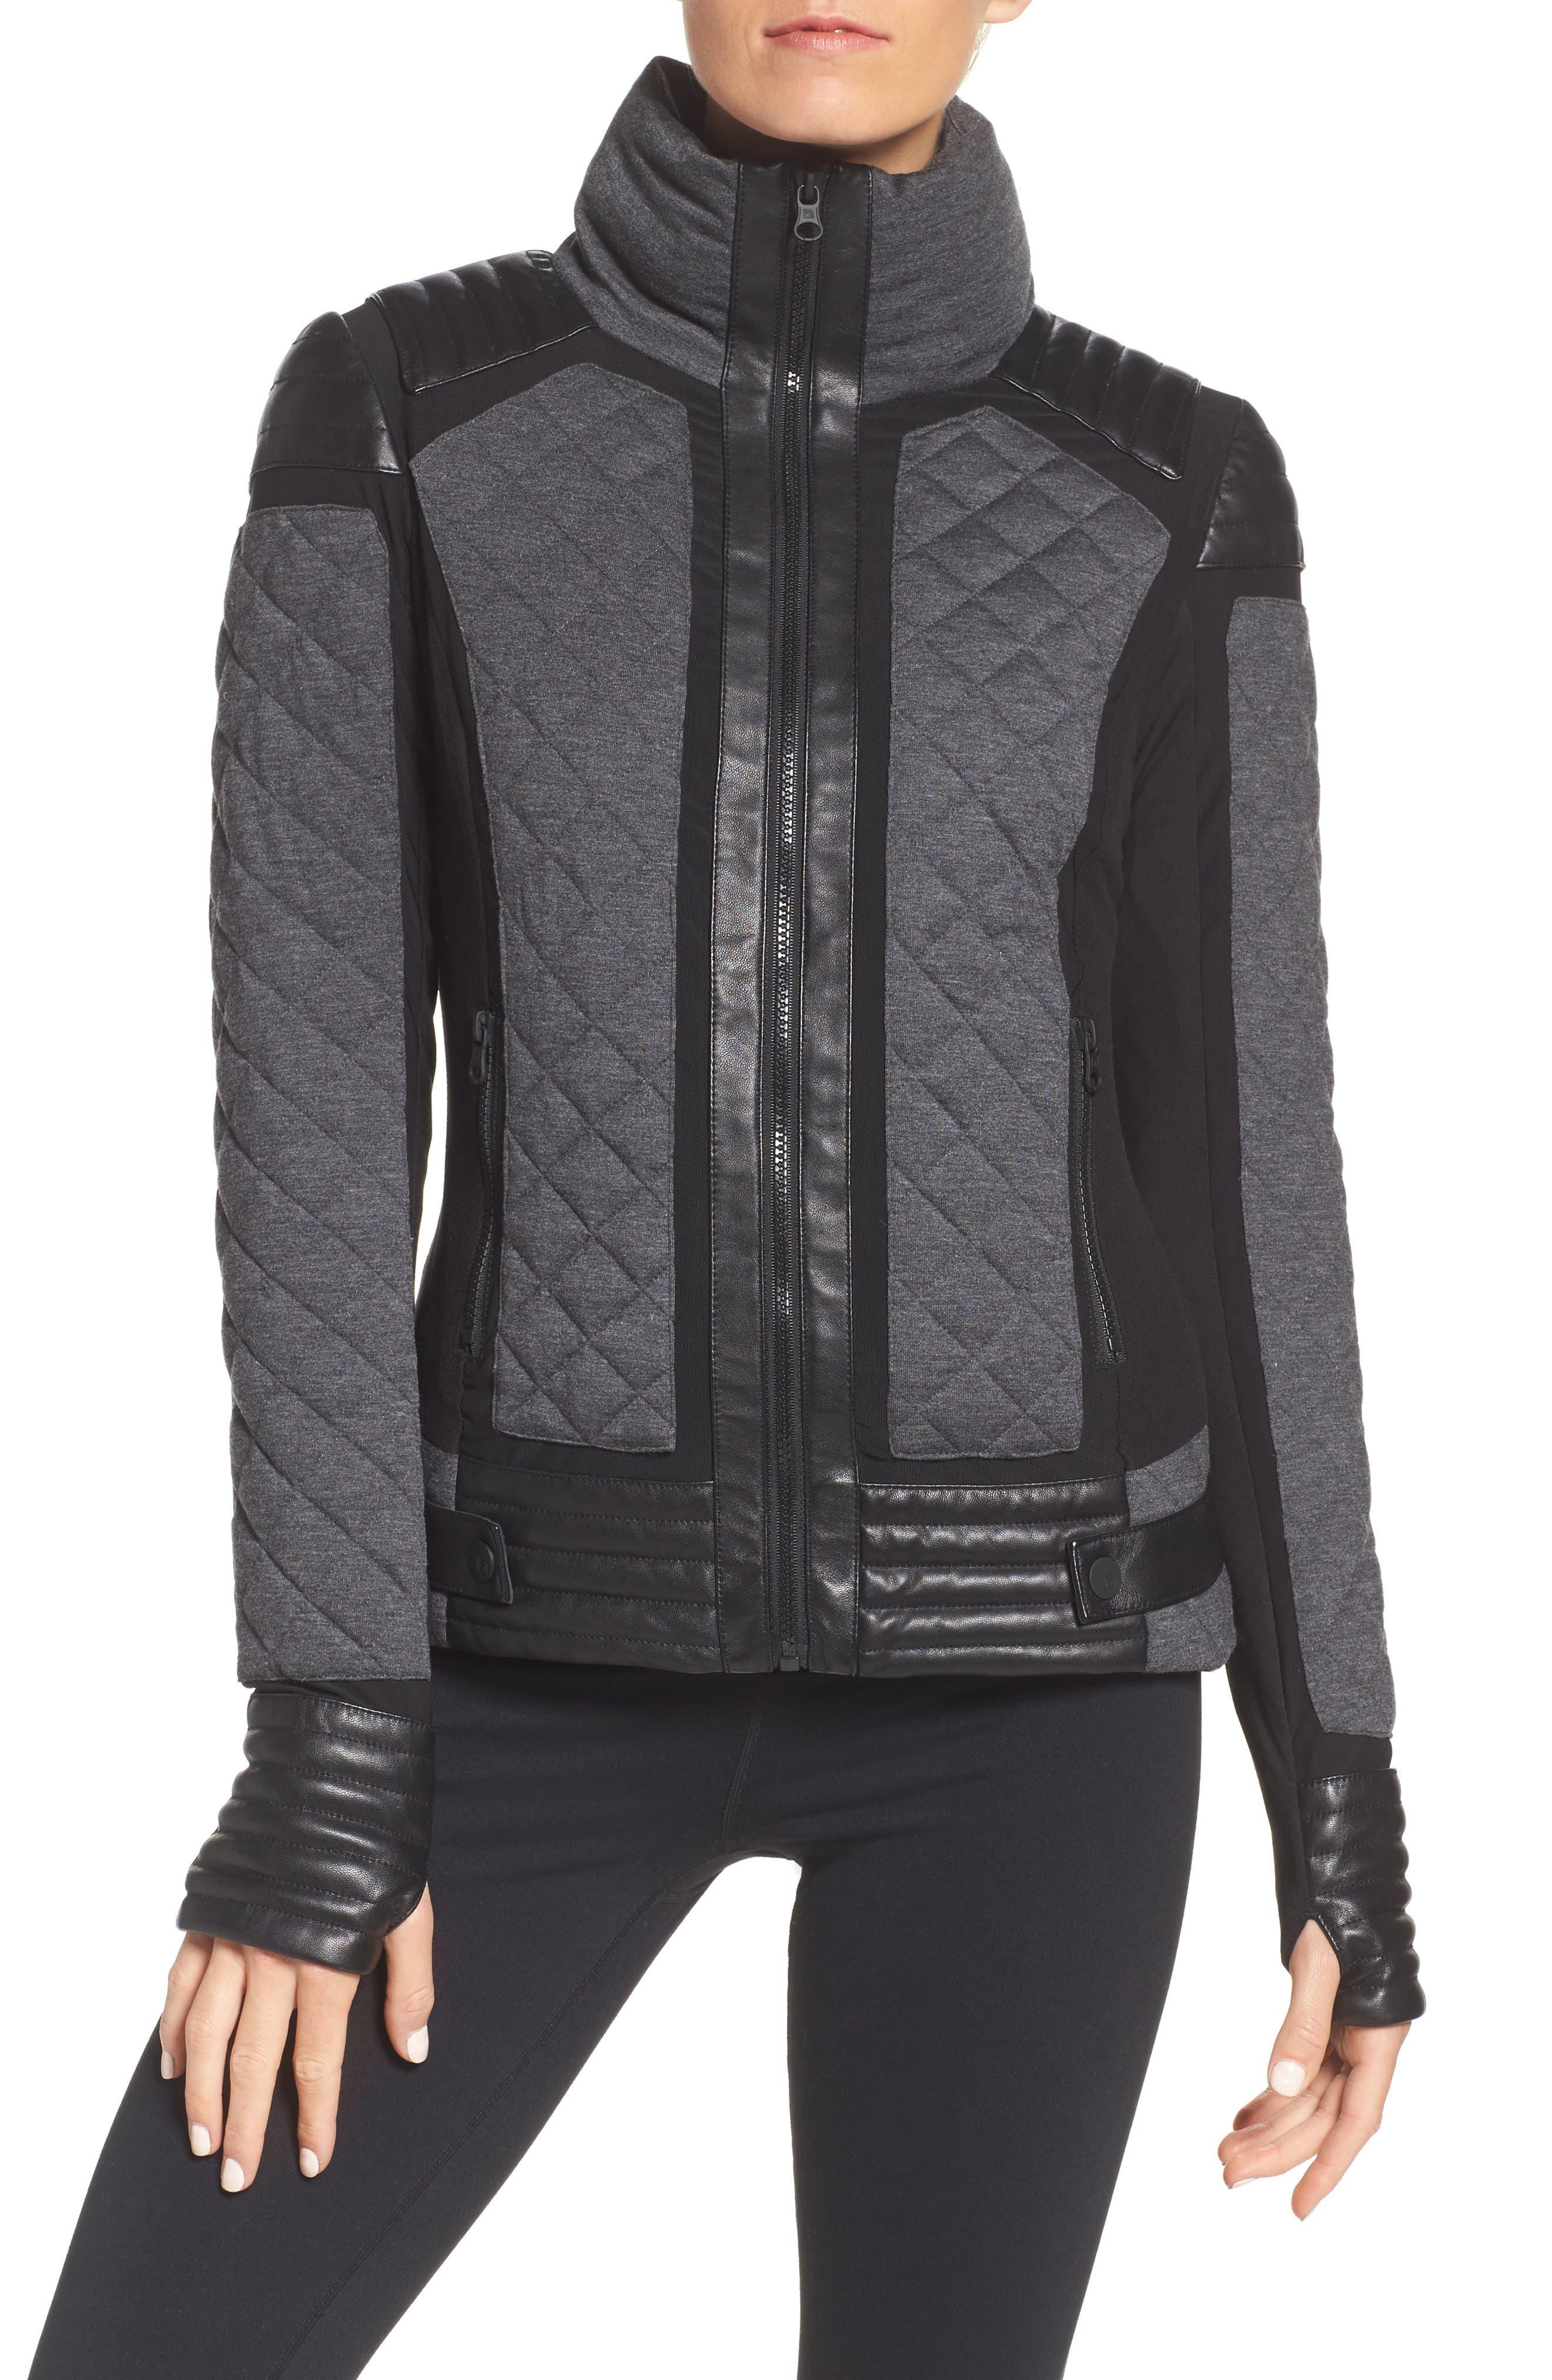 Alternate Image 1 Selected - Blanc Noir Mesh Inset Moto Jacket